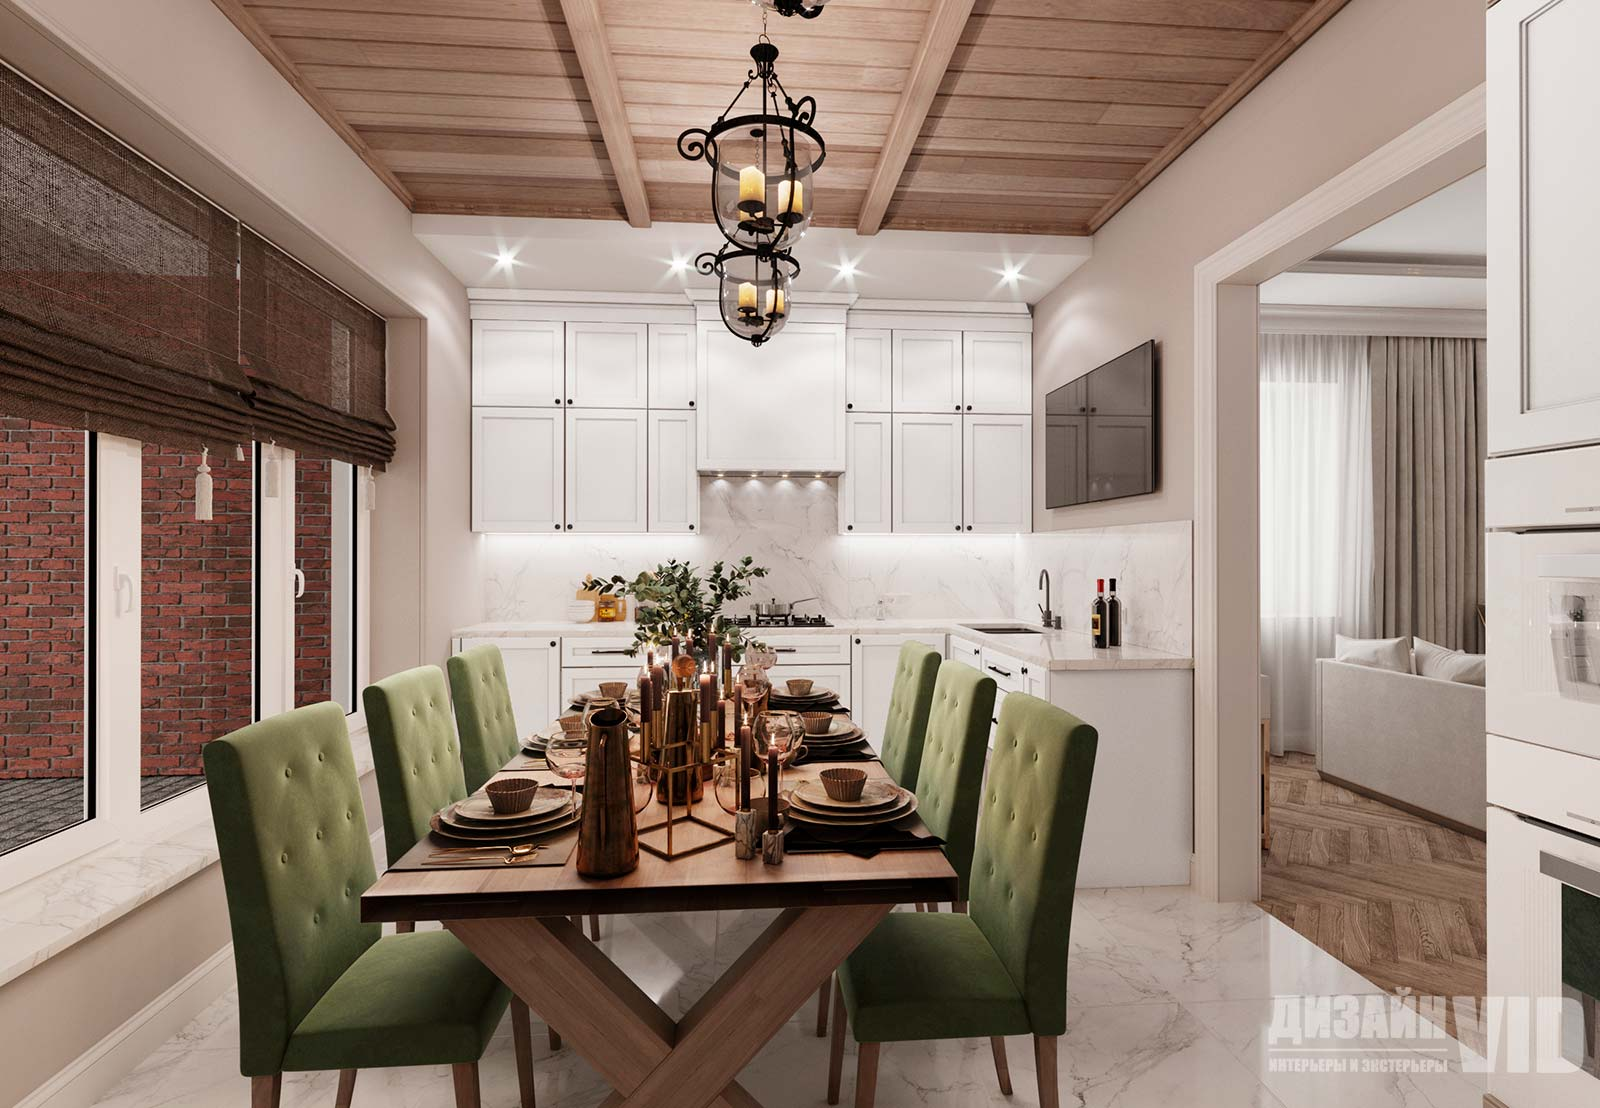 дизайн кухни с элементами стиля прованс